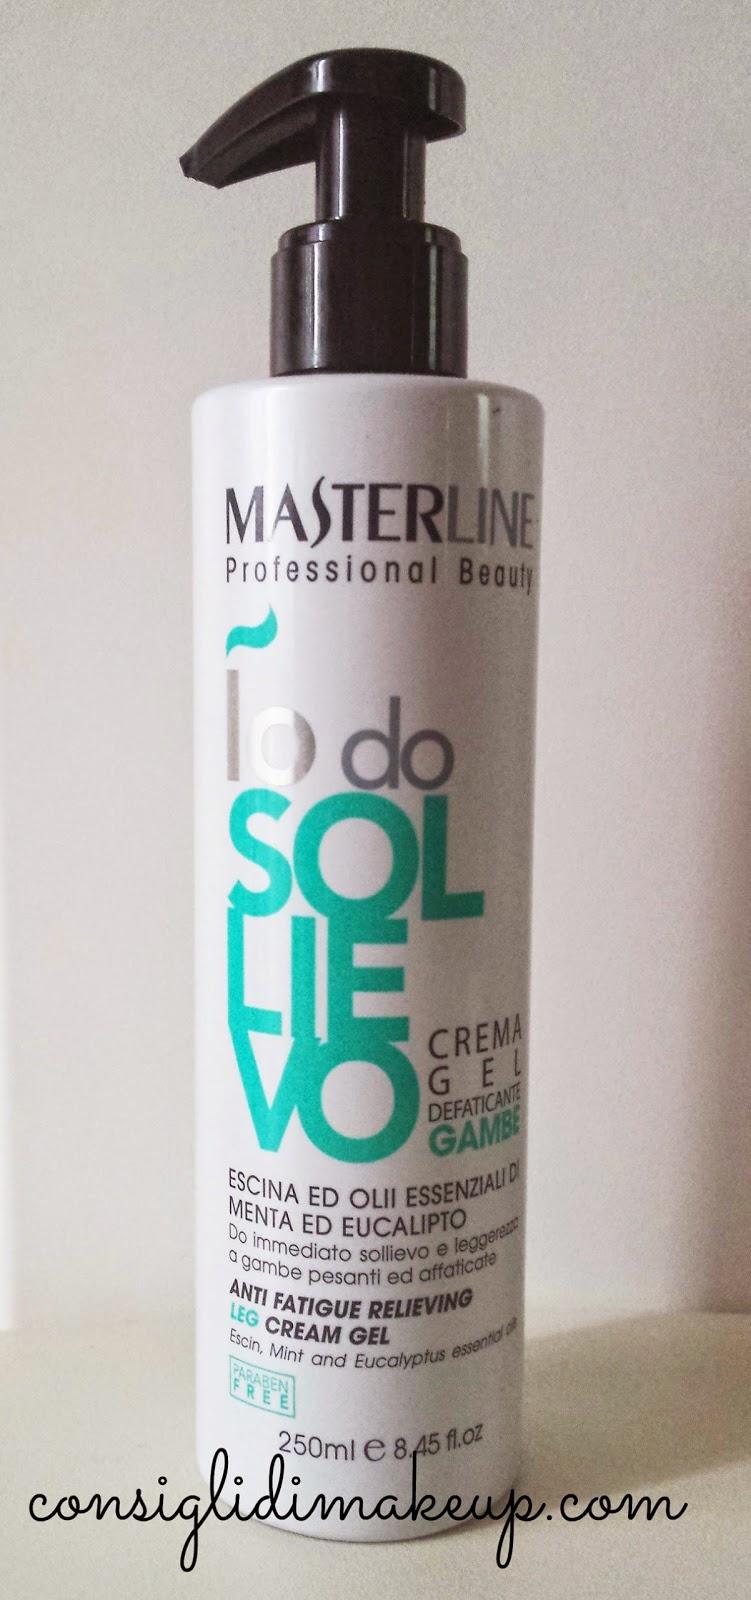 Review: Io do Sollievo Crema Gel Defaticante Gambe - Masterline